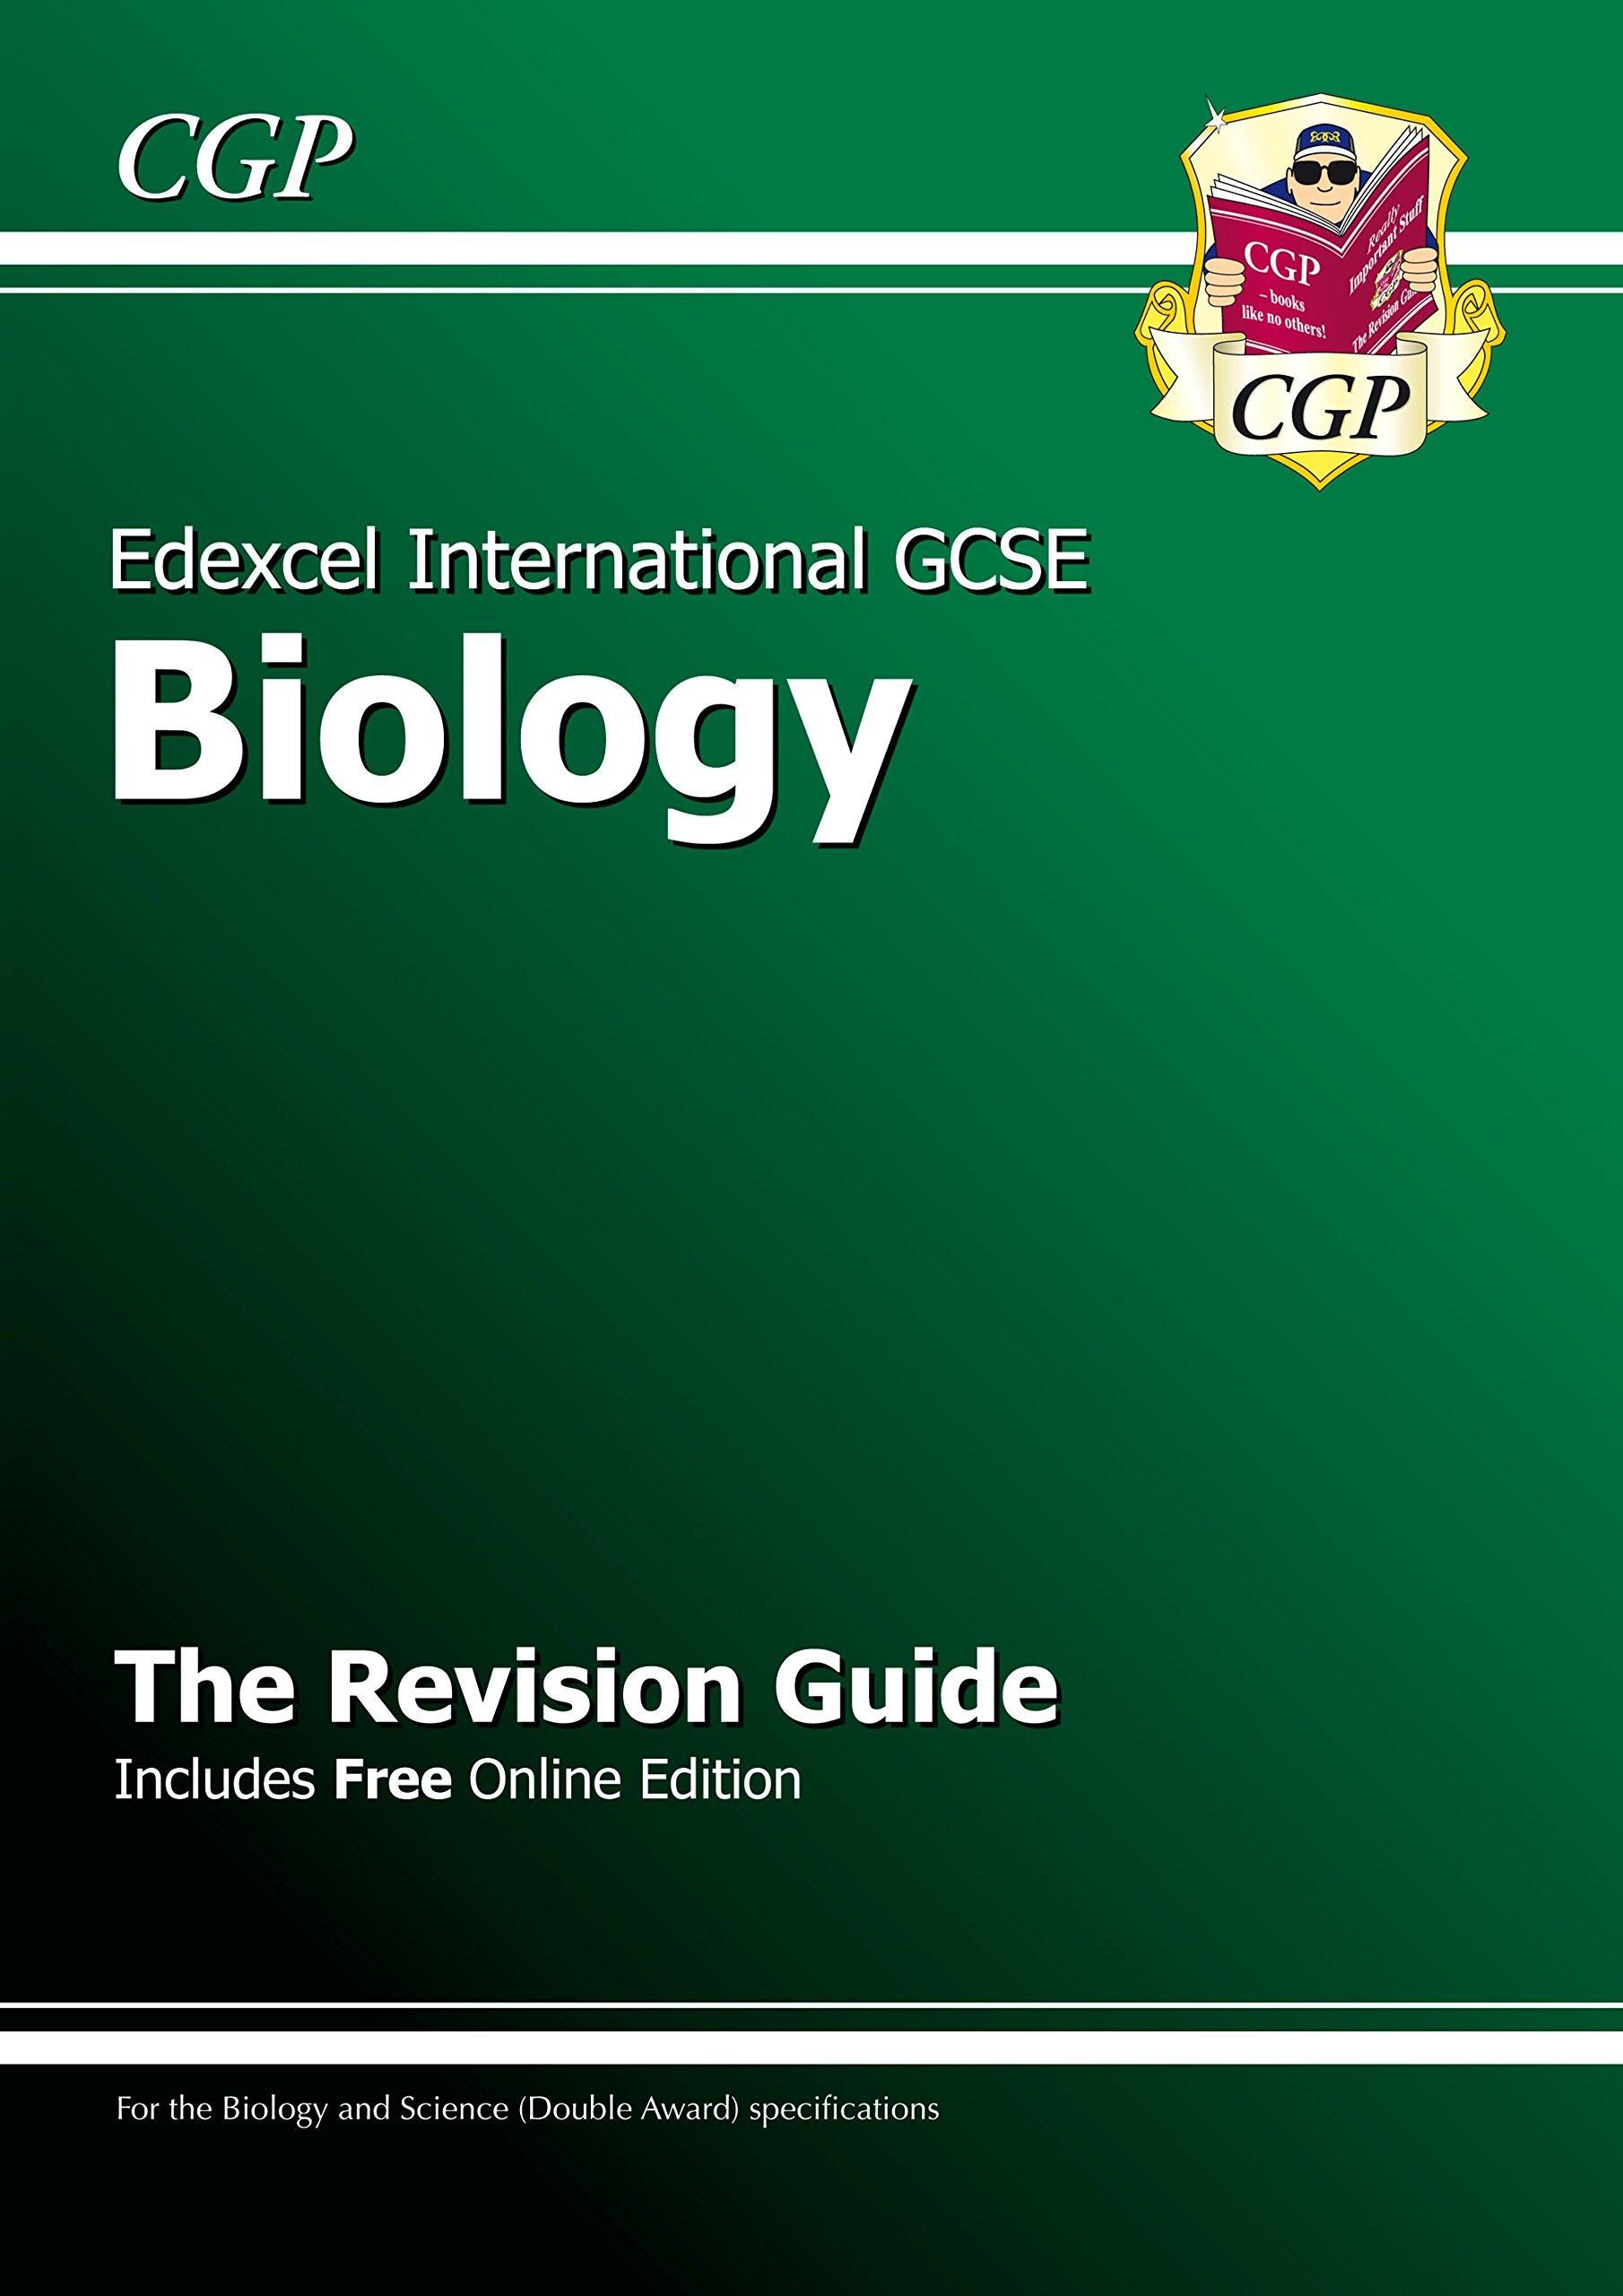 edexcel international gcse biology revision guide with online rh amazon co uk edexcel igcse biology revision guide online edexcel igcse biology revision guide answers